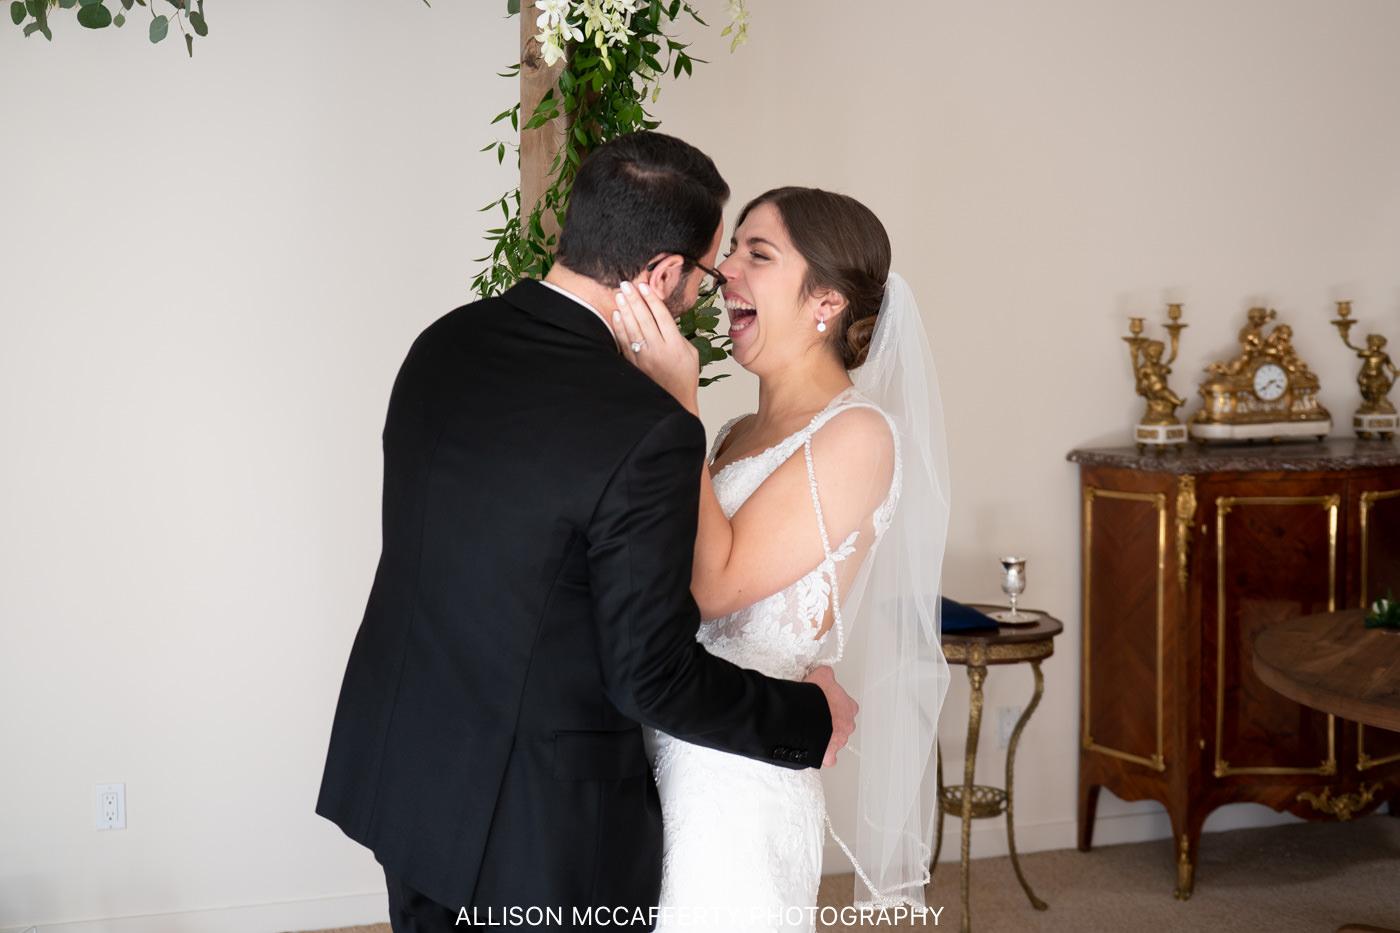 NJ Small Wedding Photography